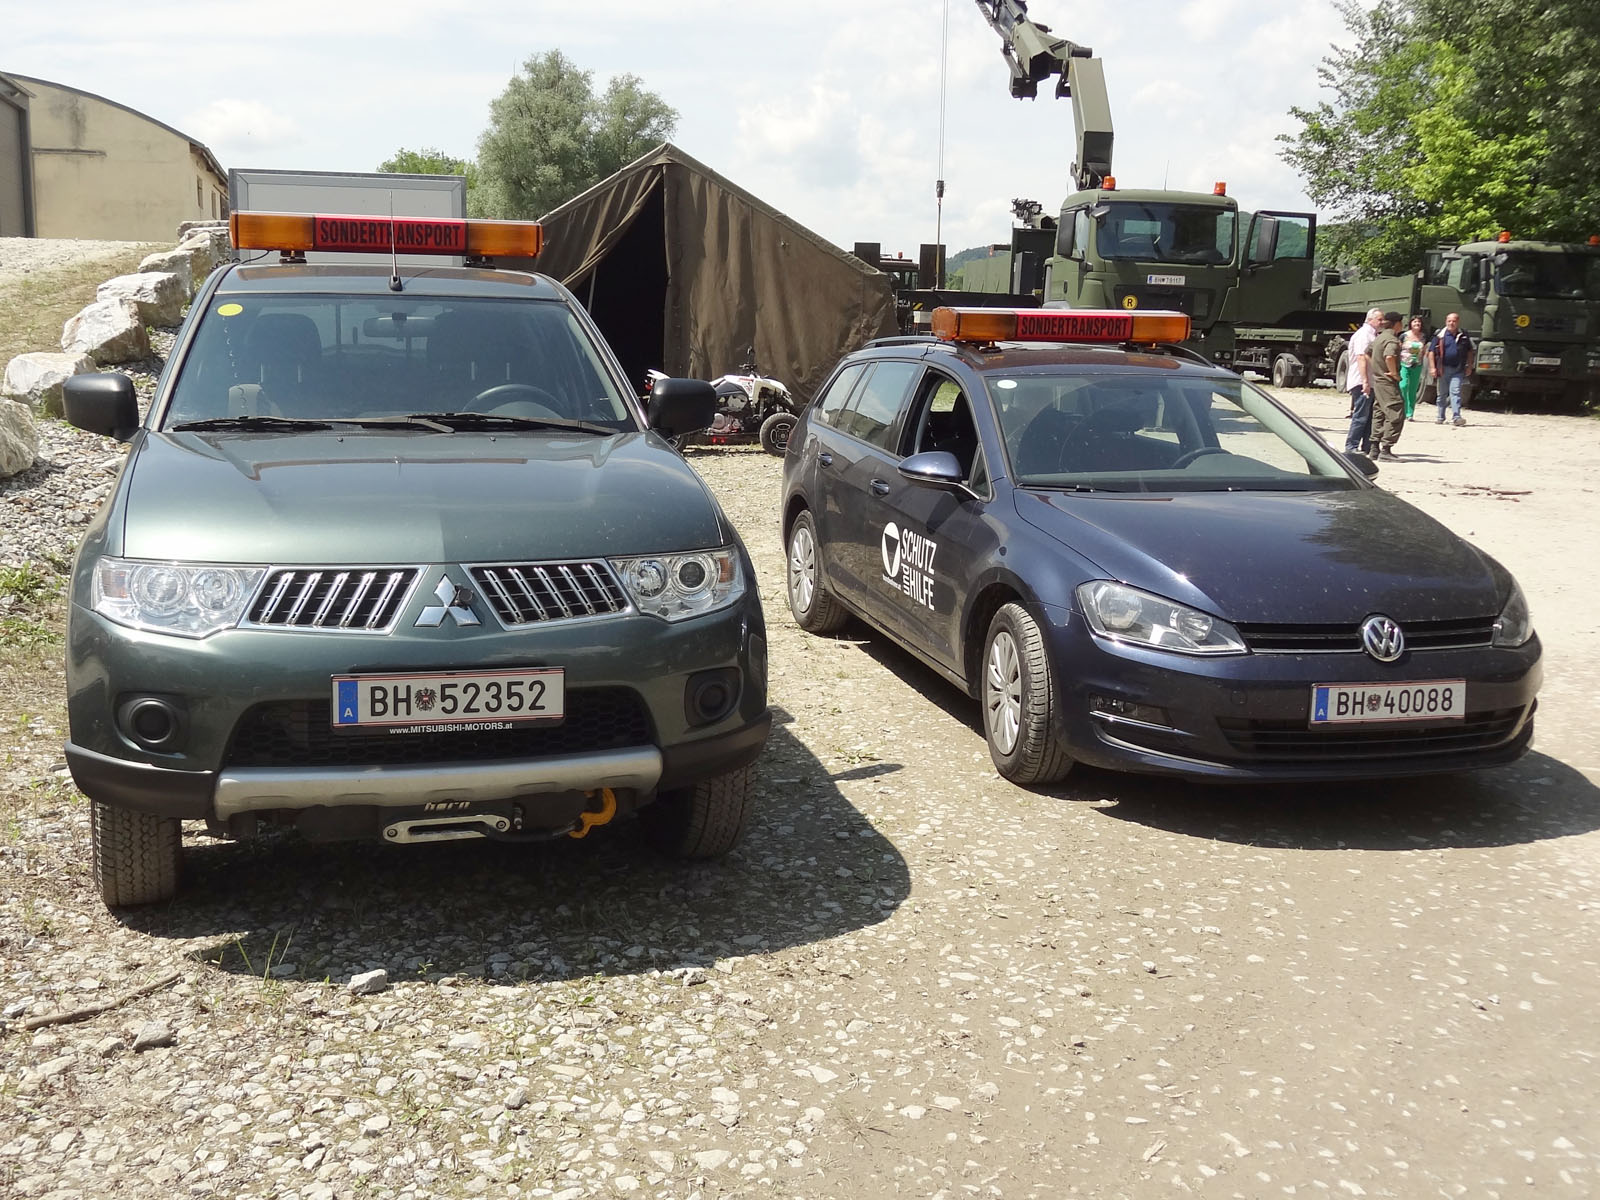 Neue Fahrzeuge - links Mitsubishi L200, rechts VW Golf Kombi © Doppeladler.com